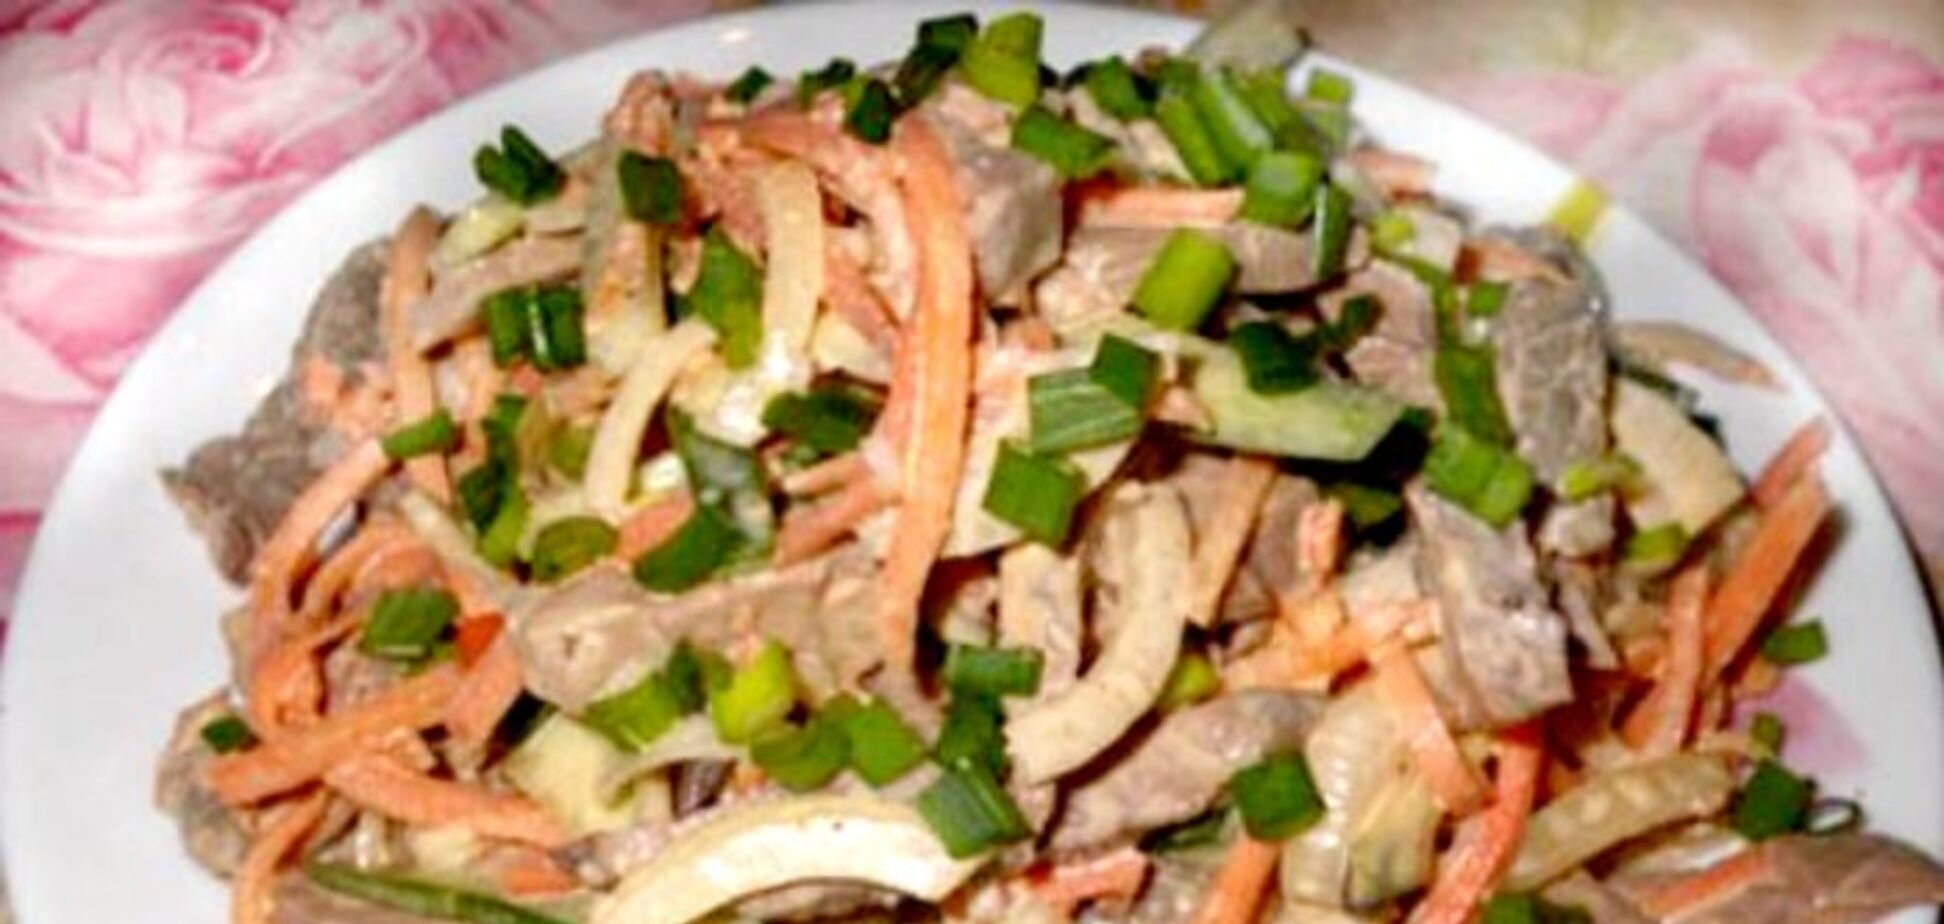 Рецепт дуже смачного салату, який можна заготовити про запас